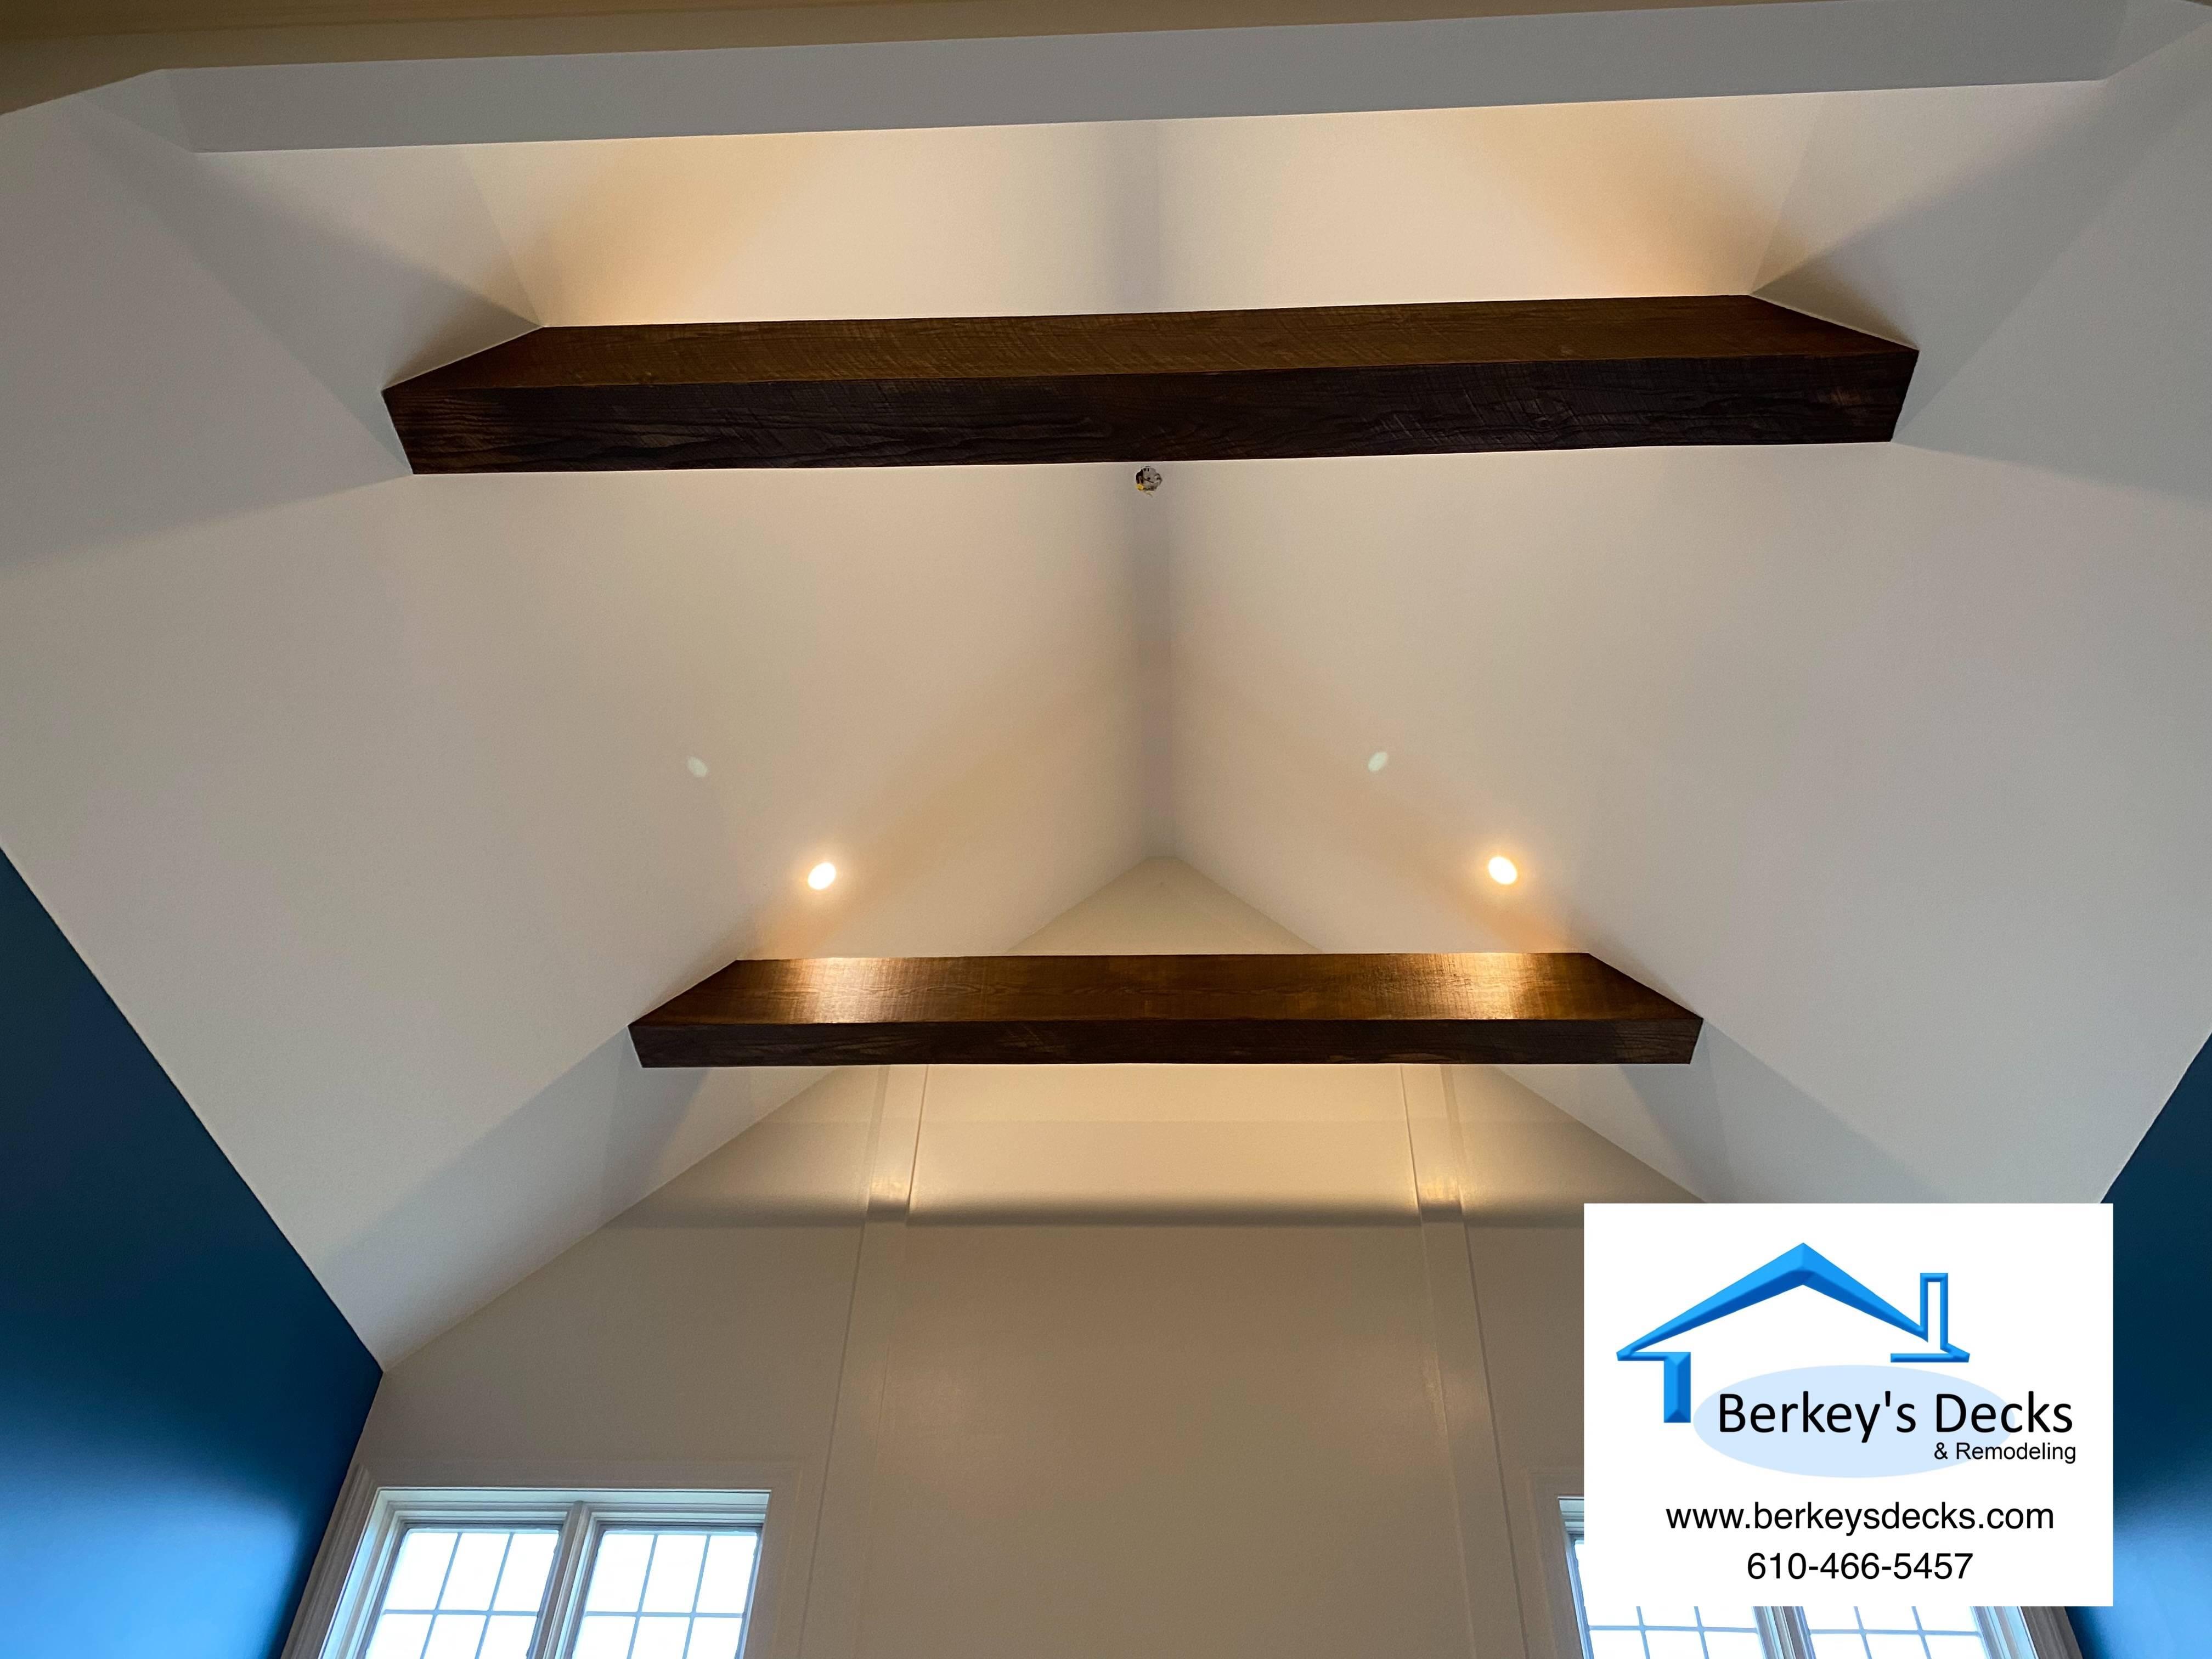 Custom made and installed beams